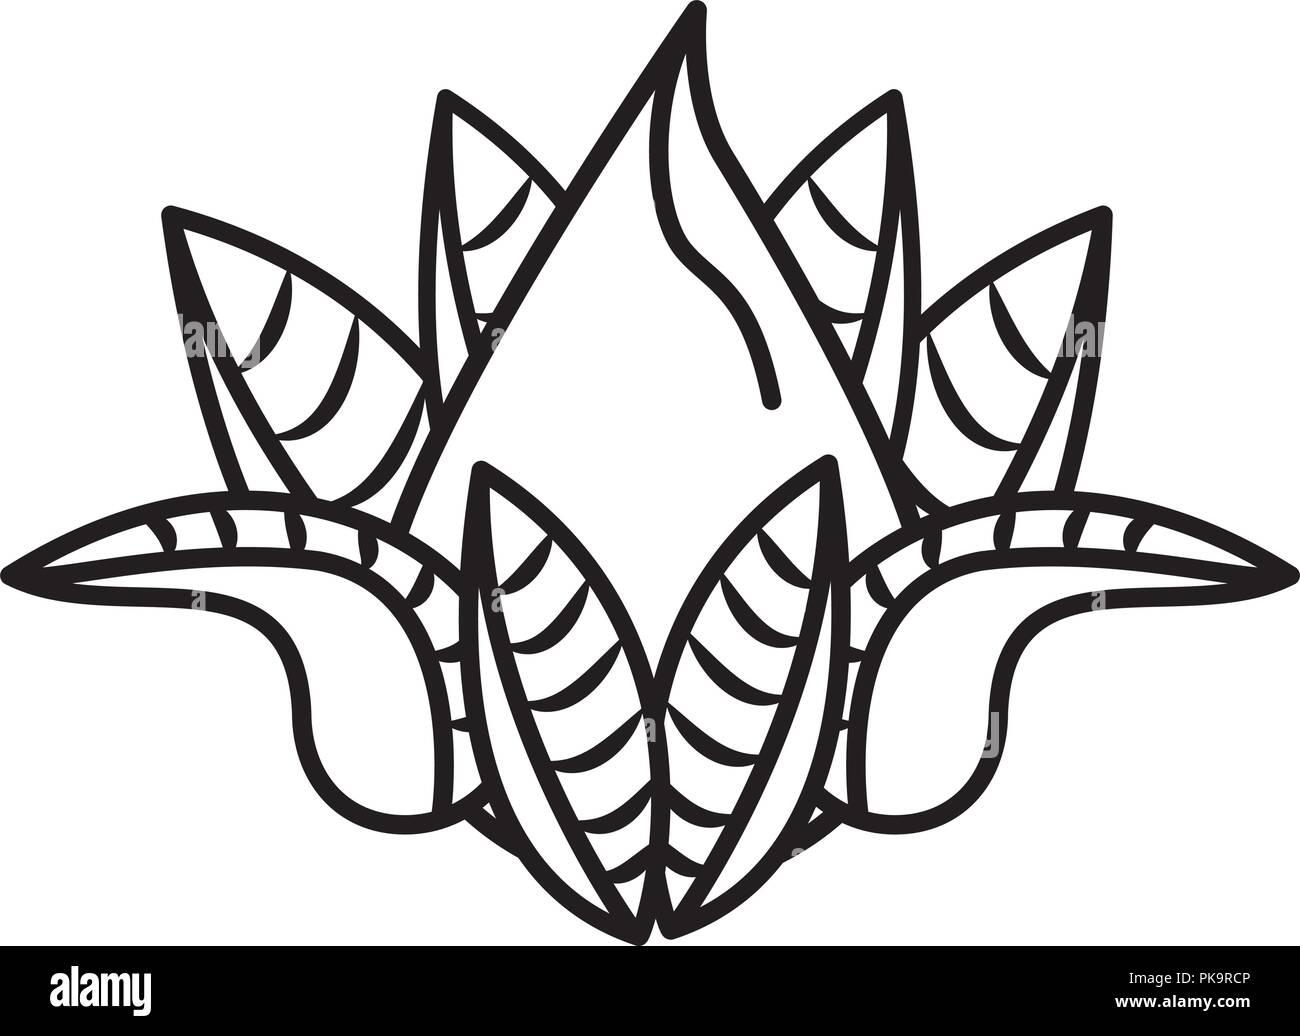 Lotus Flower Cartoon In Black And White Stock Vector Art